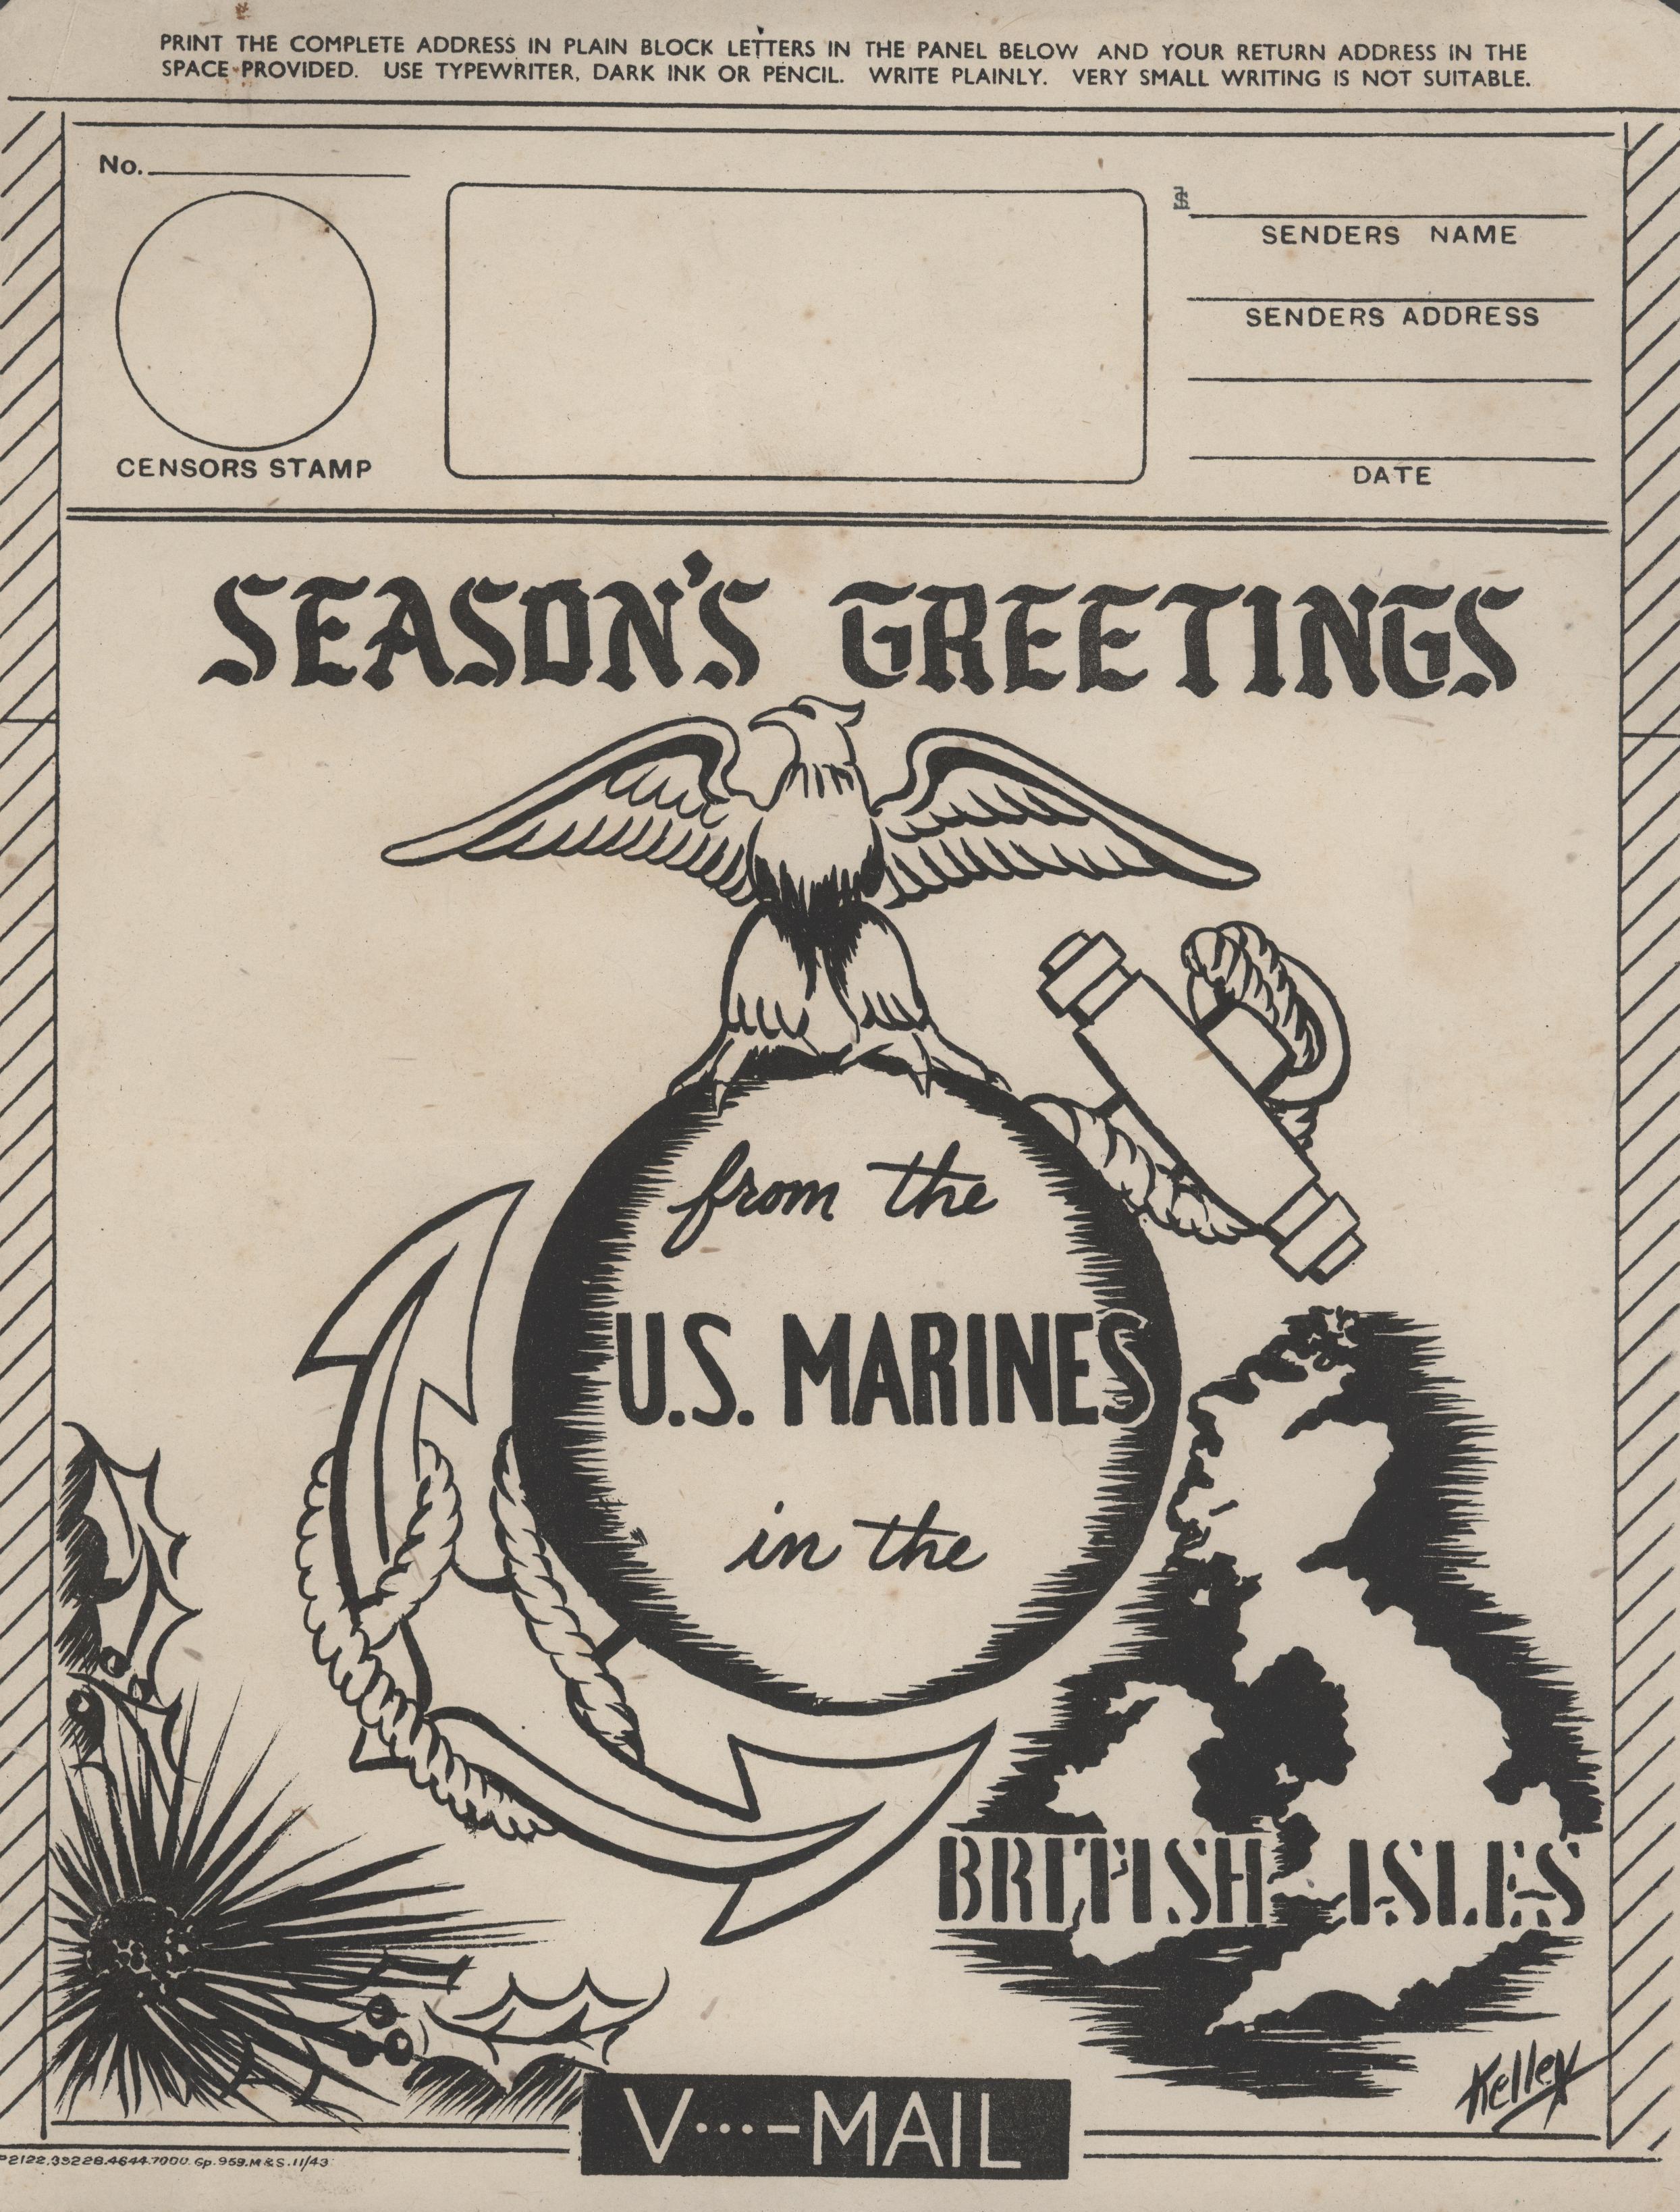 United States Marine Corps V-mail - 1943